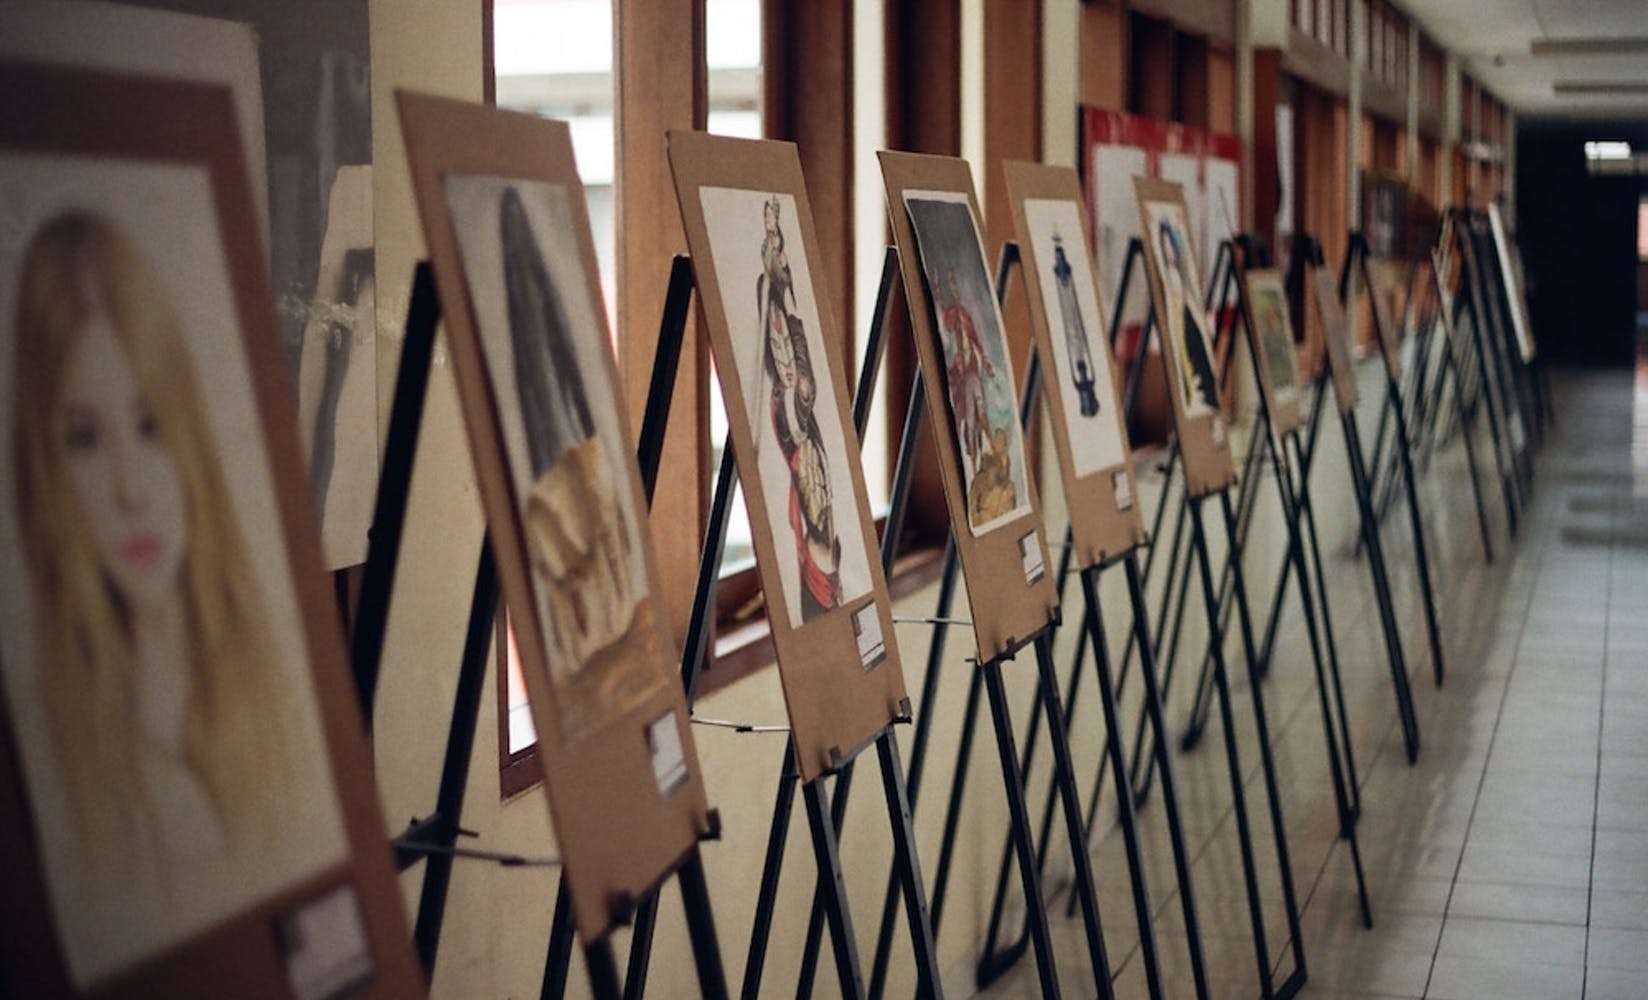 100 fundraising ideas live auction